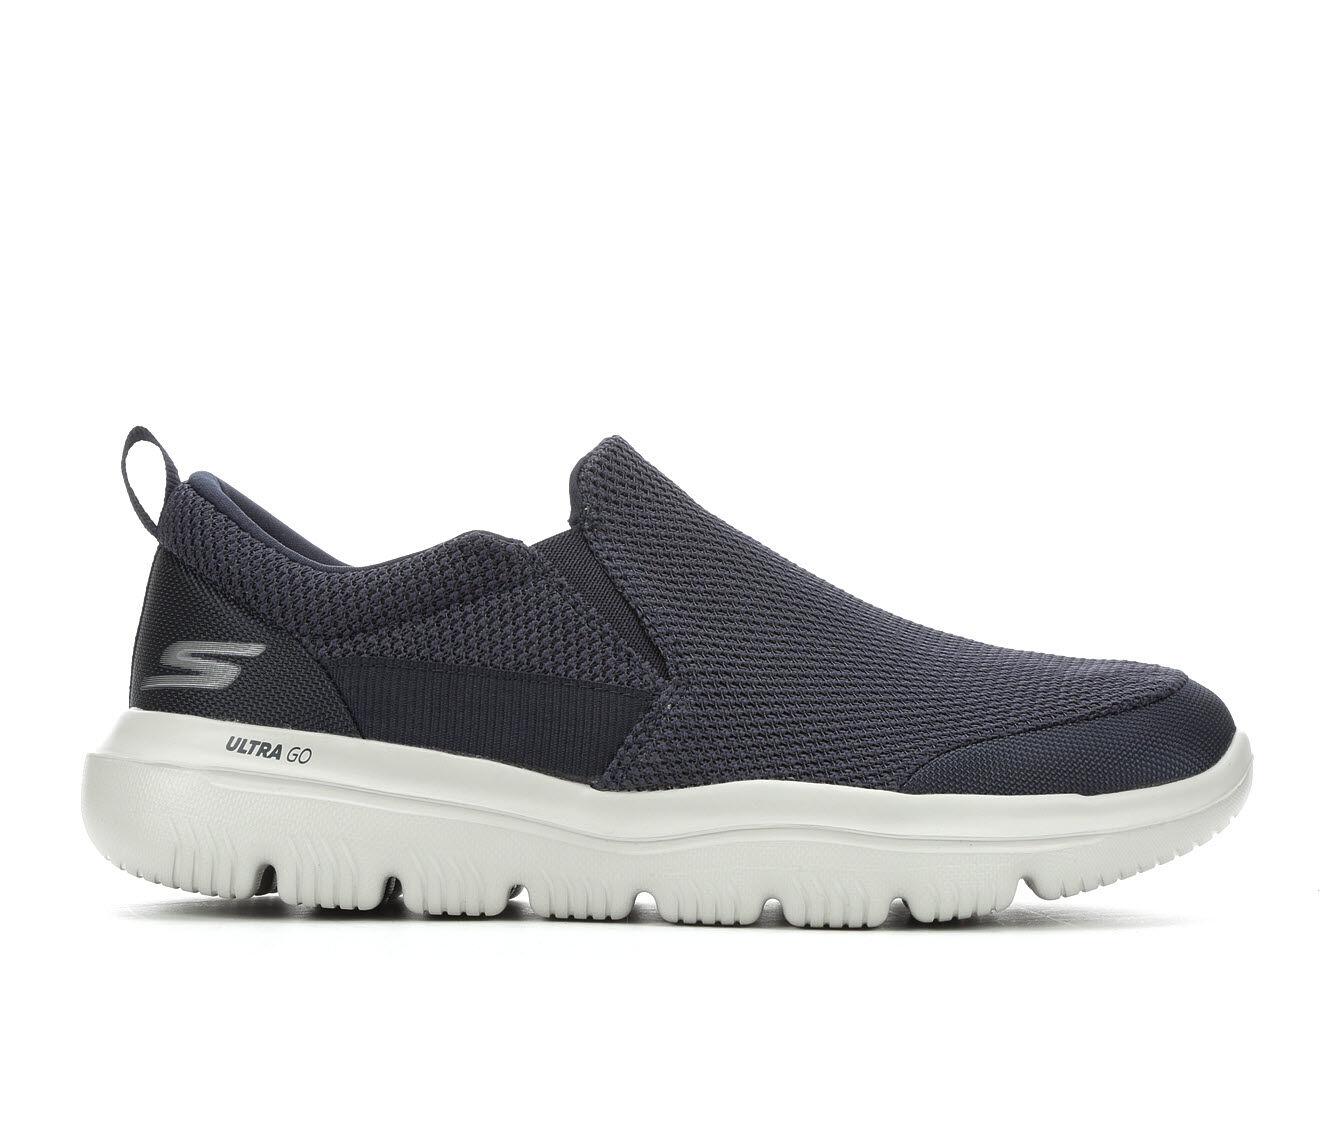 For Sale Men's Skechers Go Evolution Ultra Casual Shoes Navy/Grey